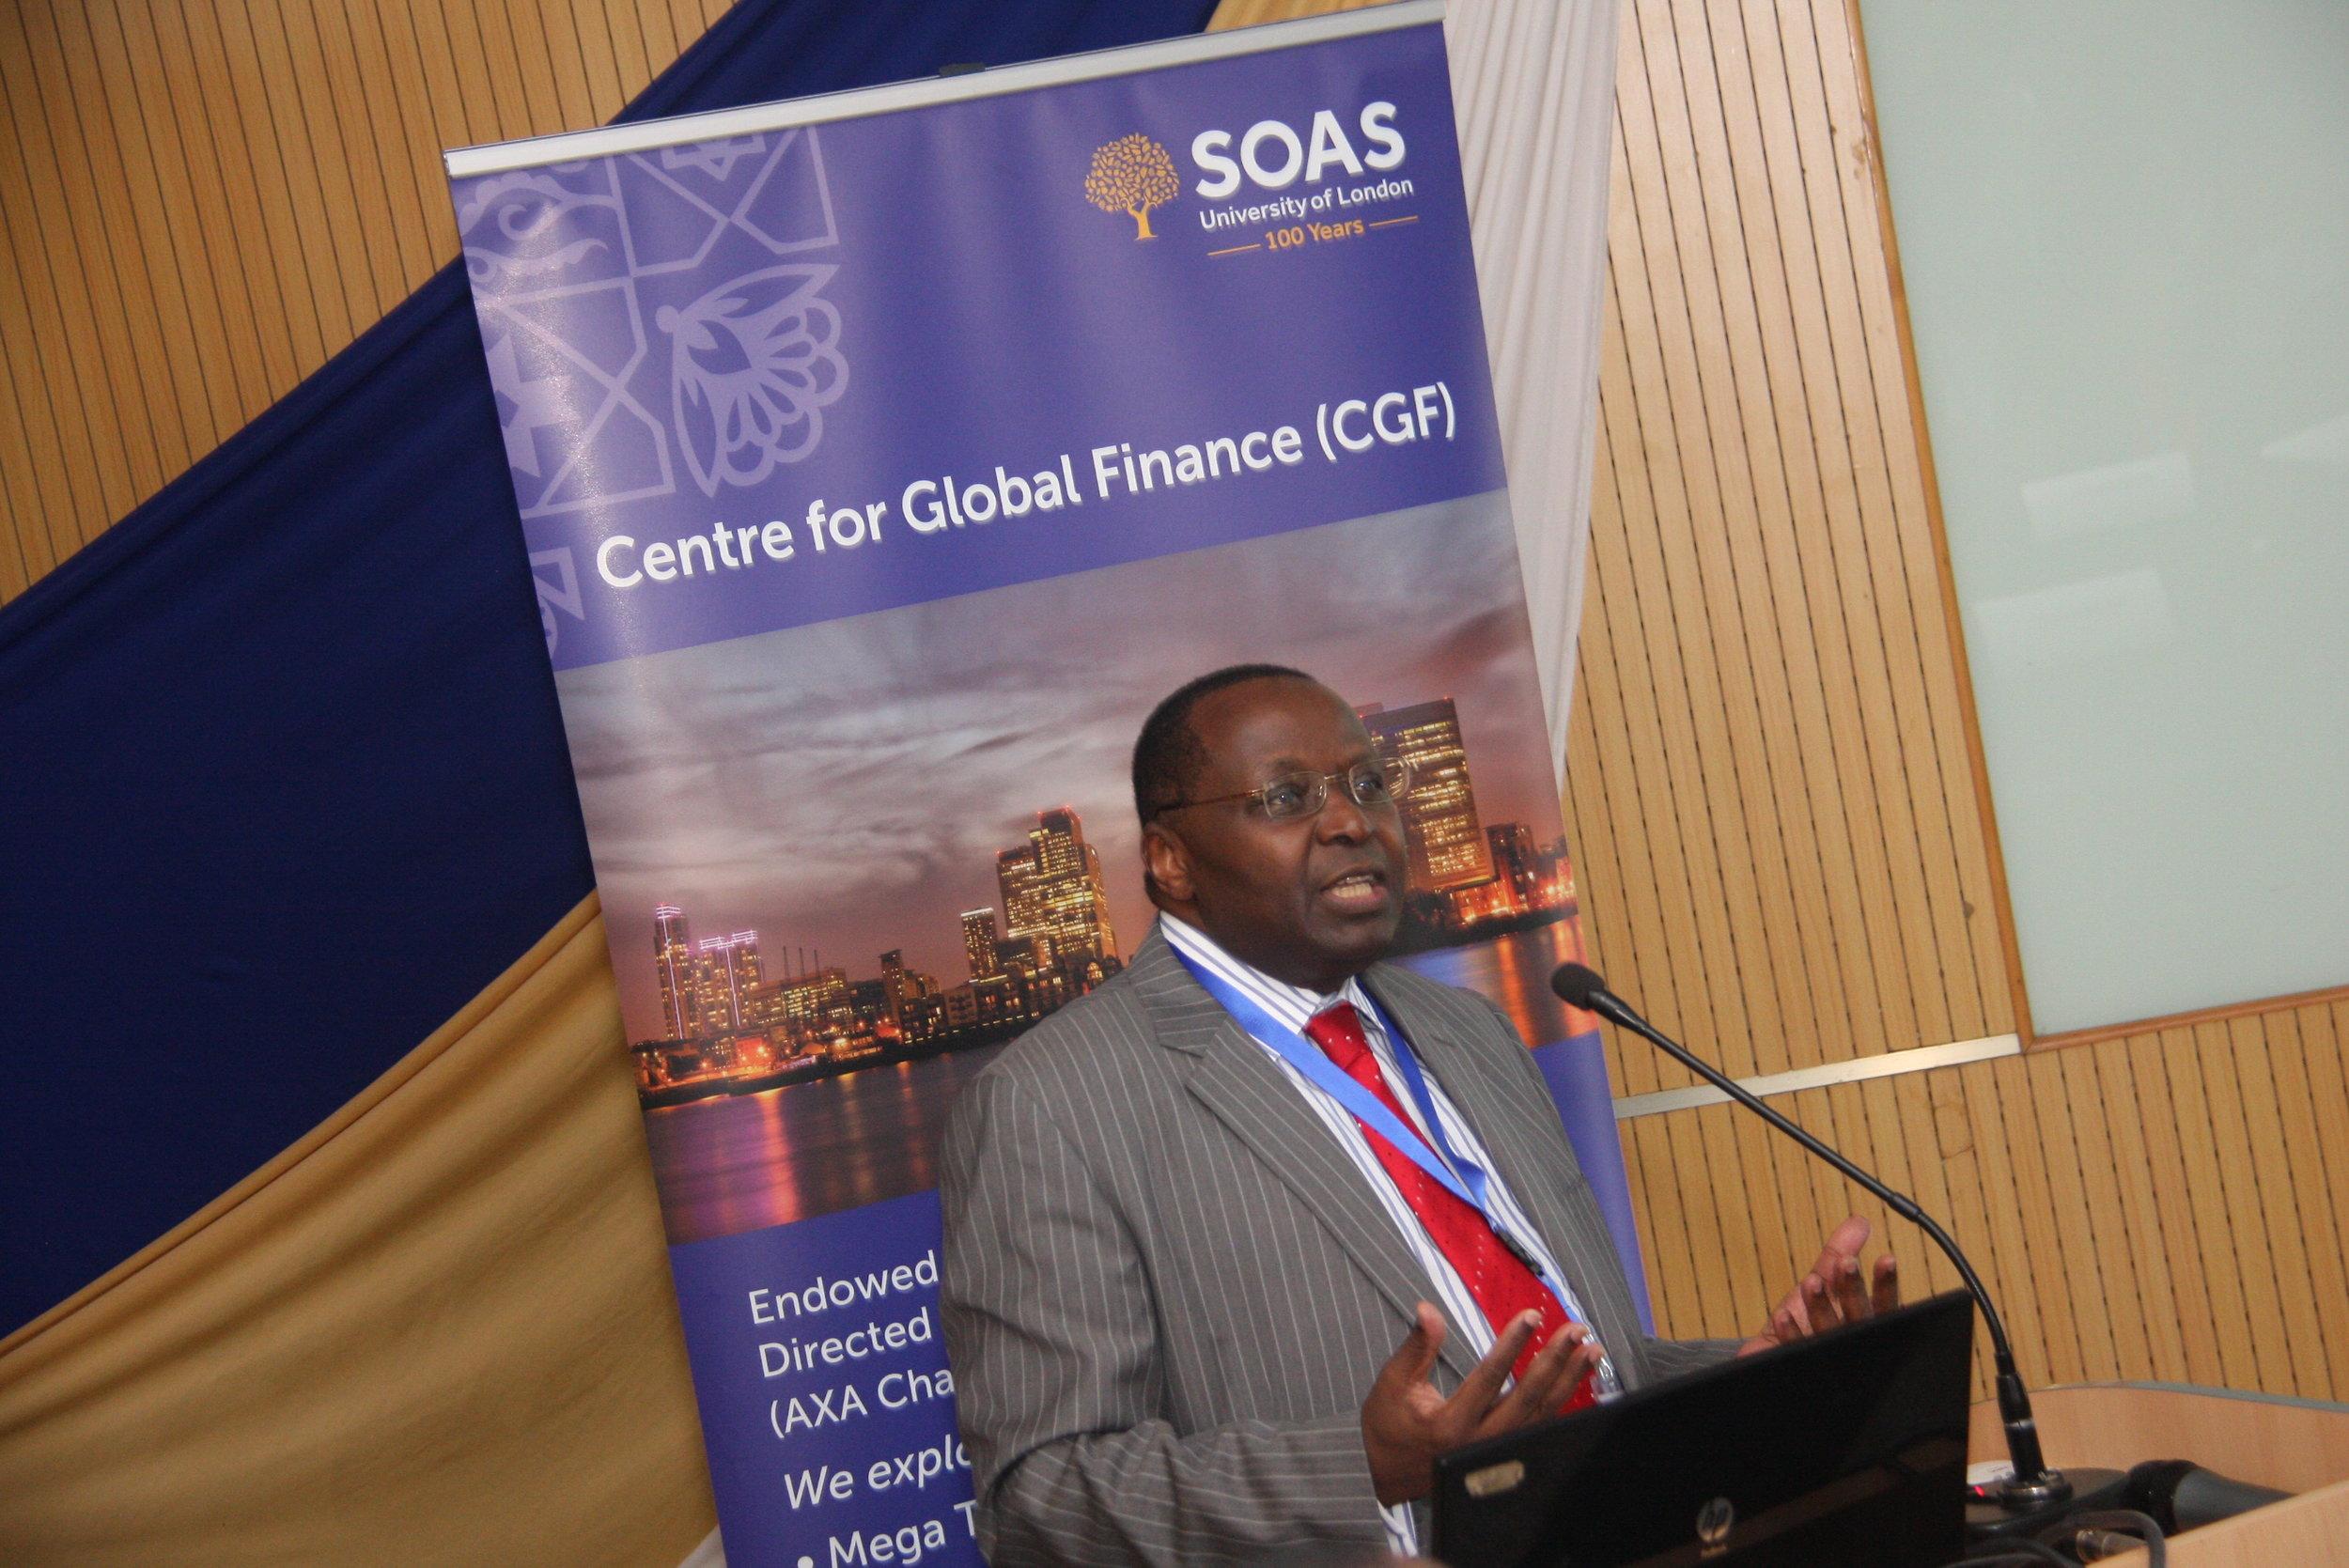 Professor Victor Murinde, Director of Centre for Global Fiance